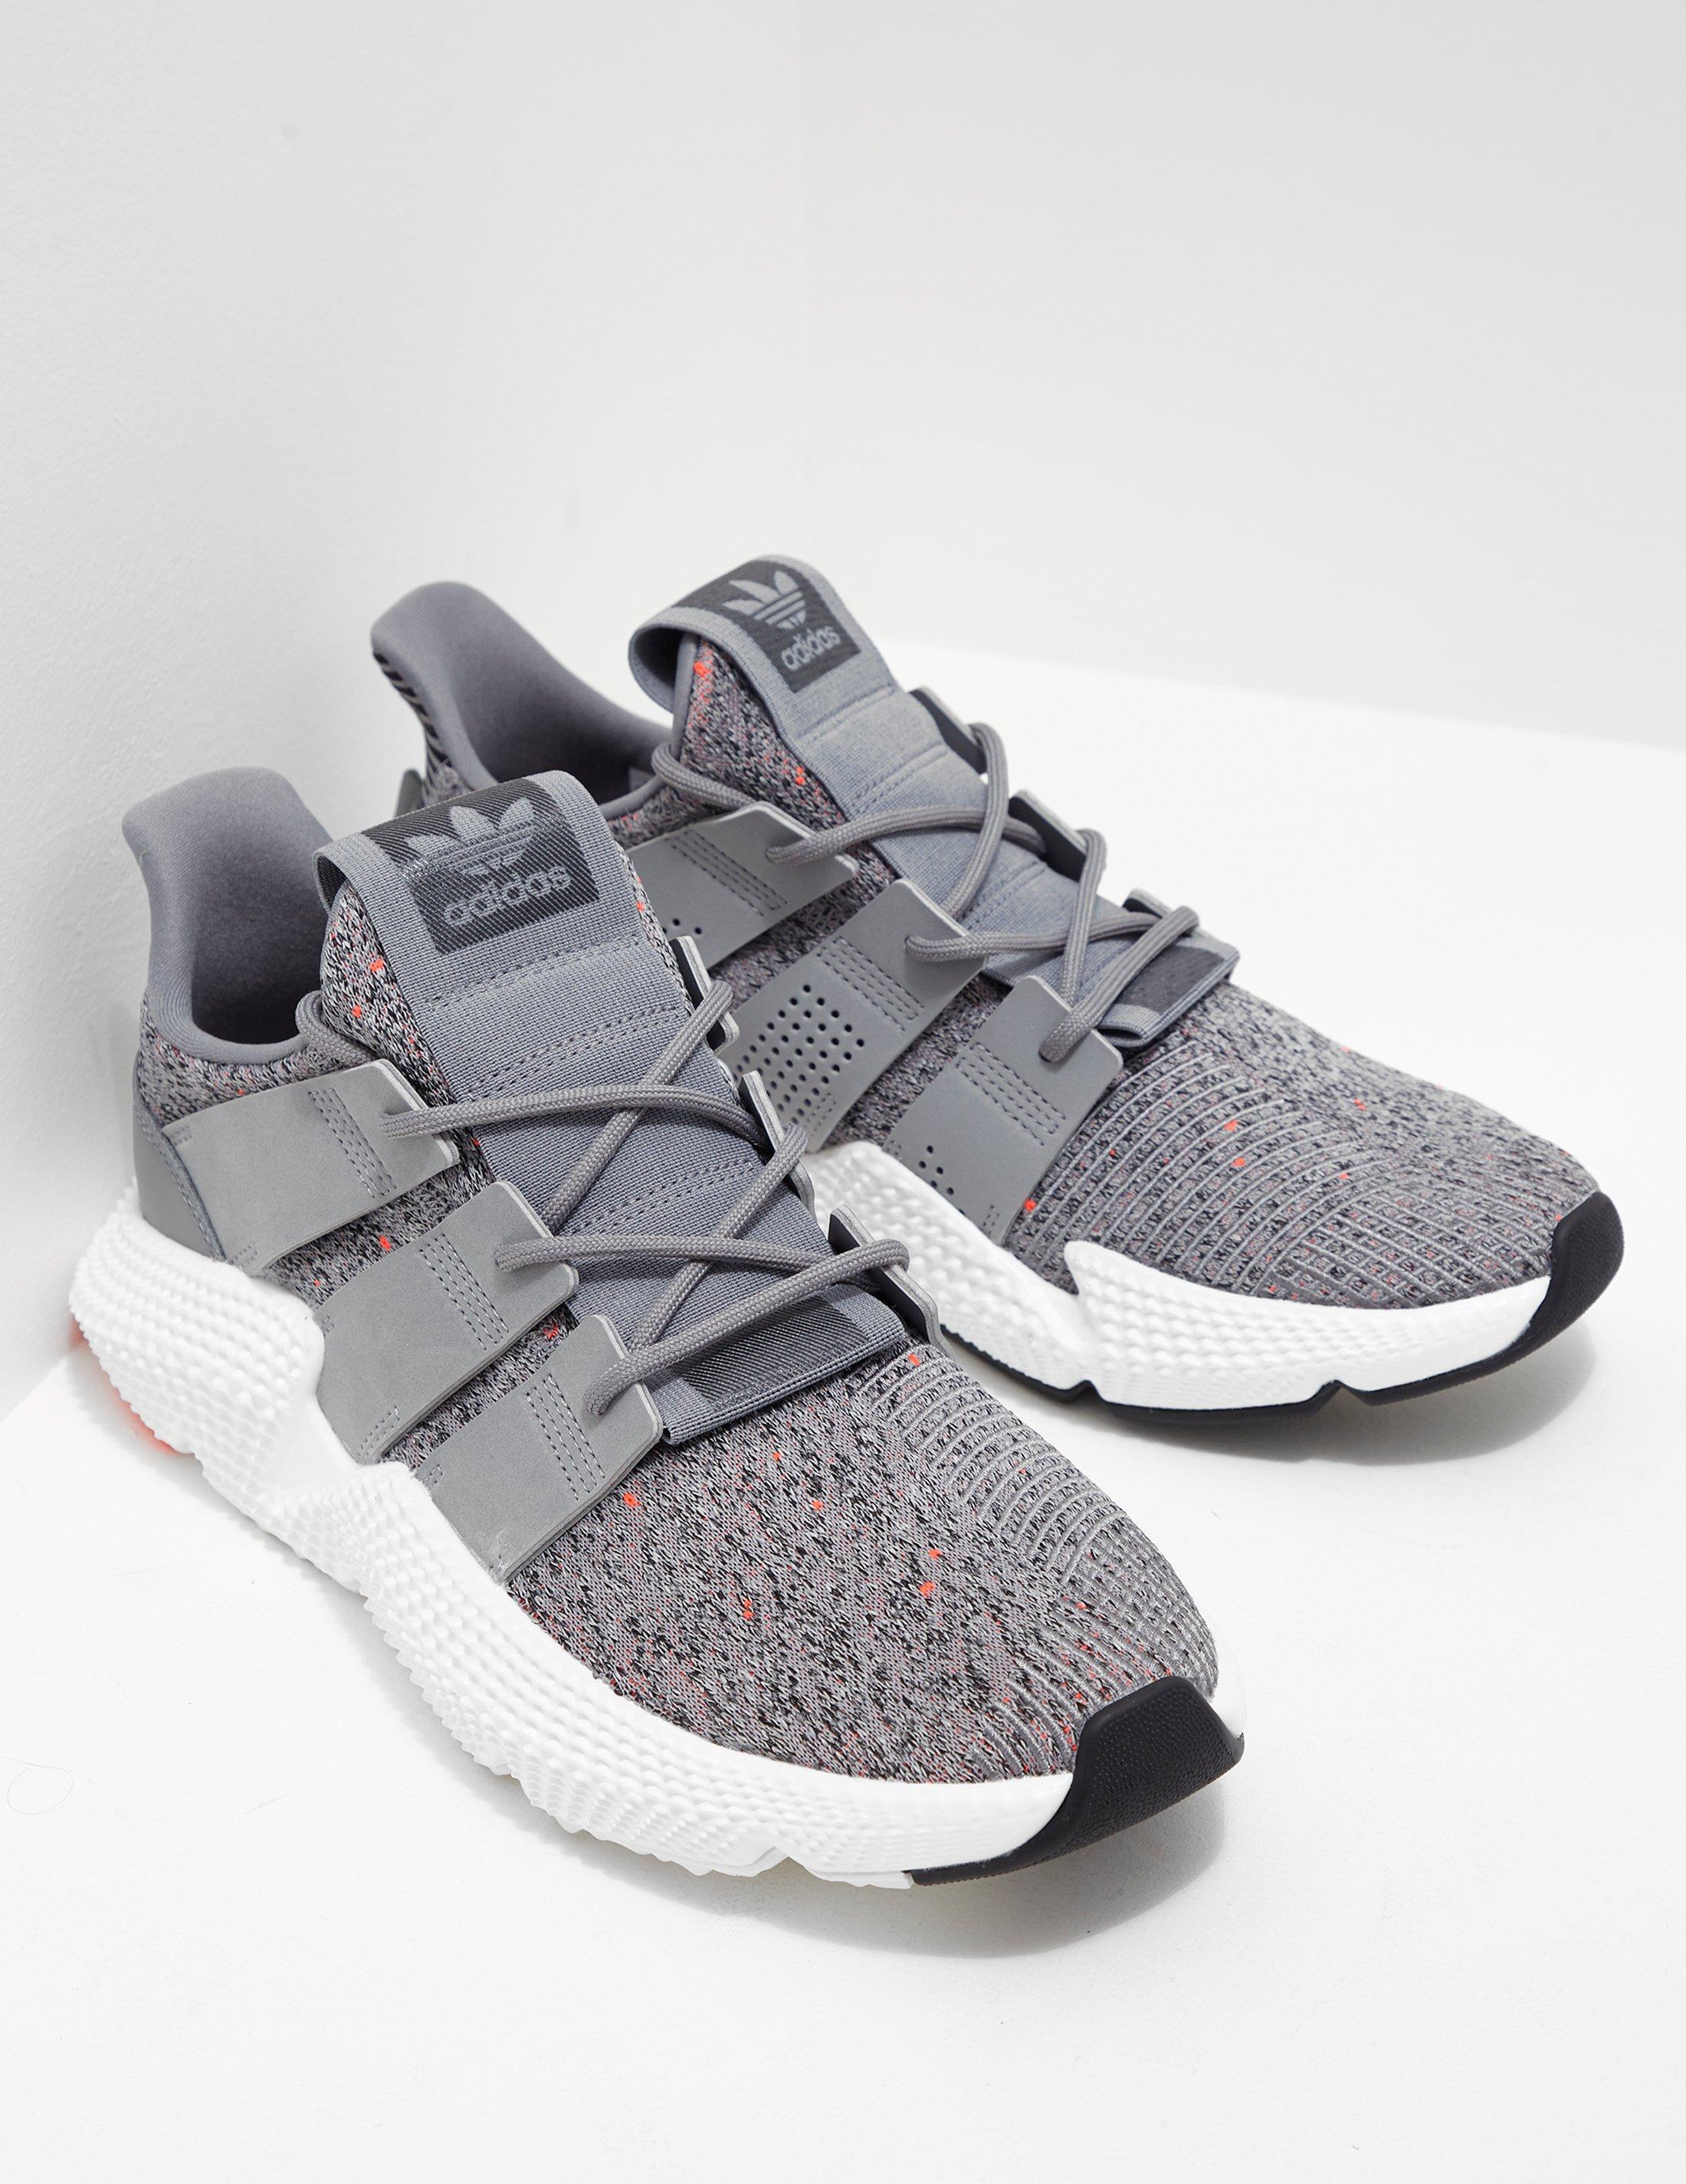 8daa8b25591f adidas Originals Mens Prophere Grey in Gray for Men - Lyst